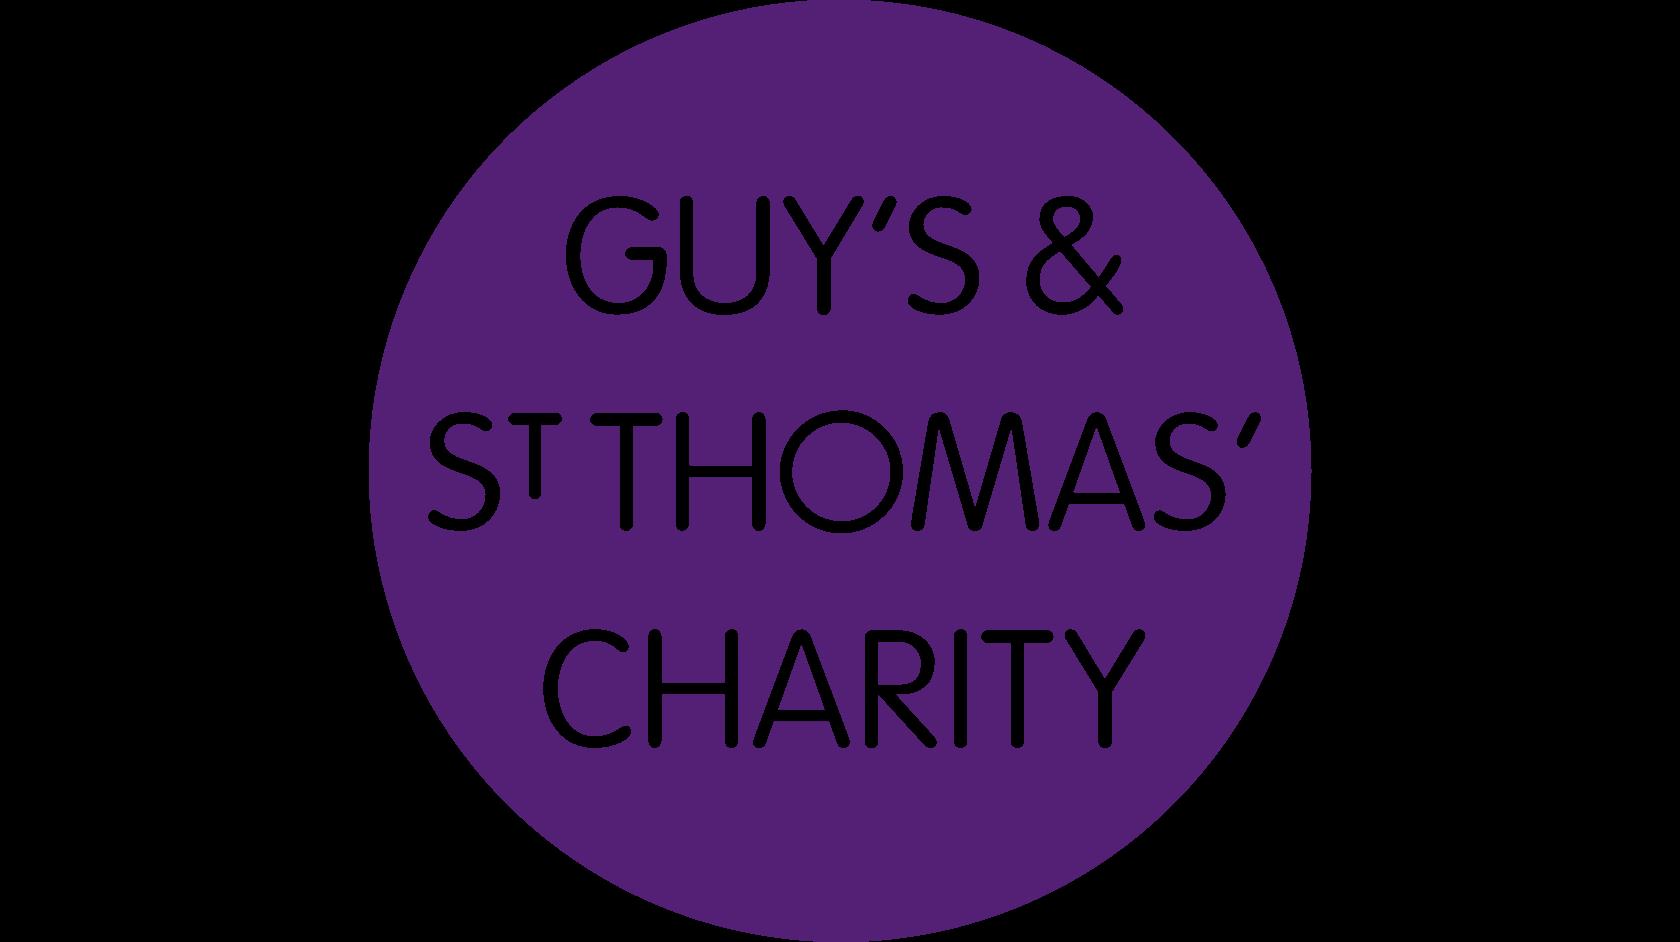 Guy's and St Thomas' charity logo